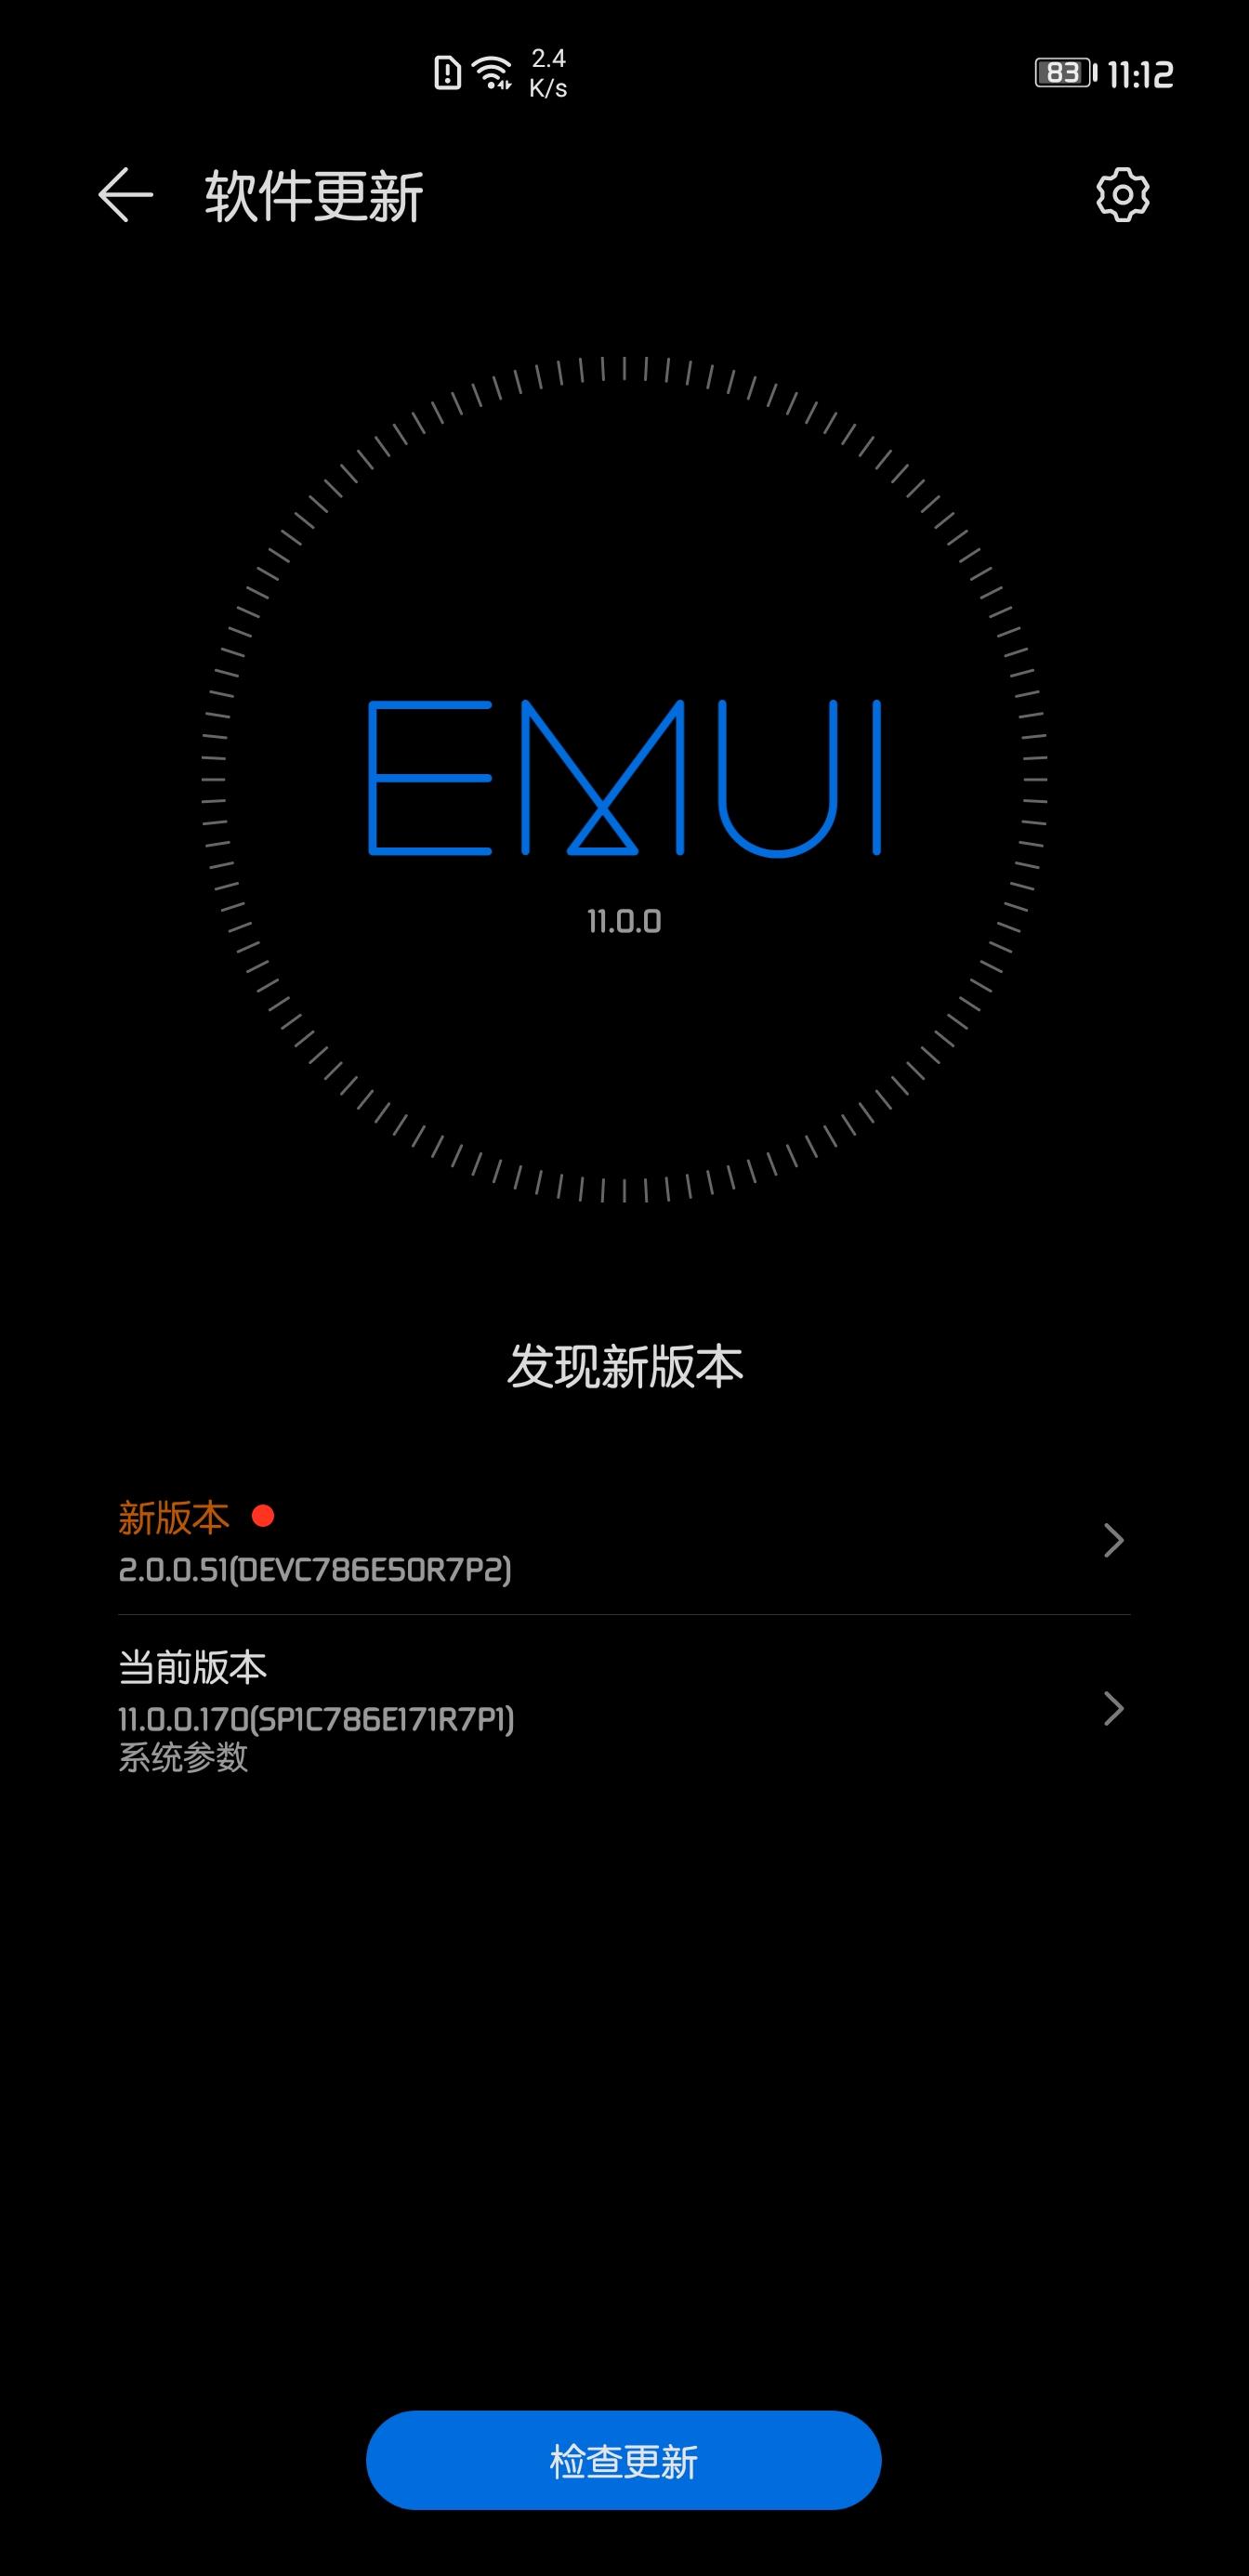 Screenshot_20210506_231231_com.huawei.android.hwouc.jpg